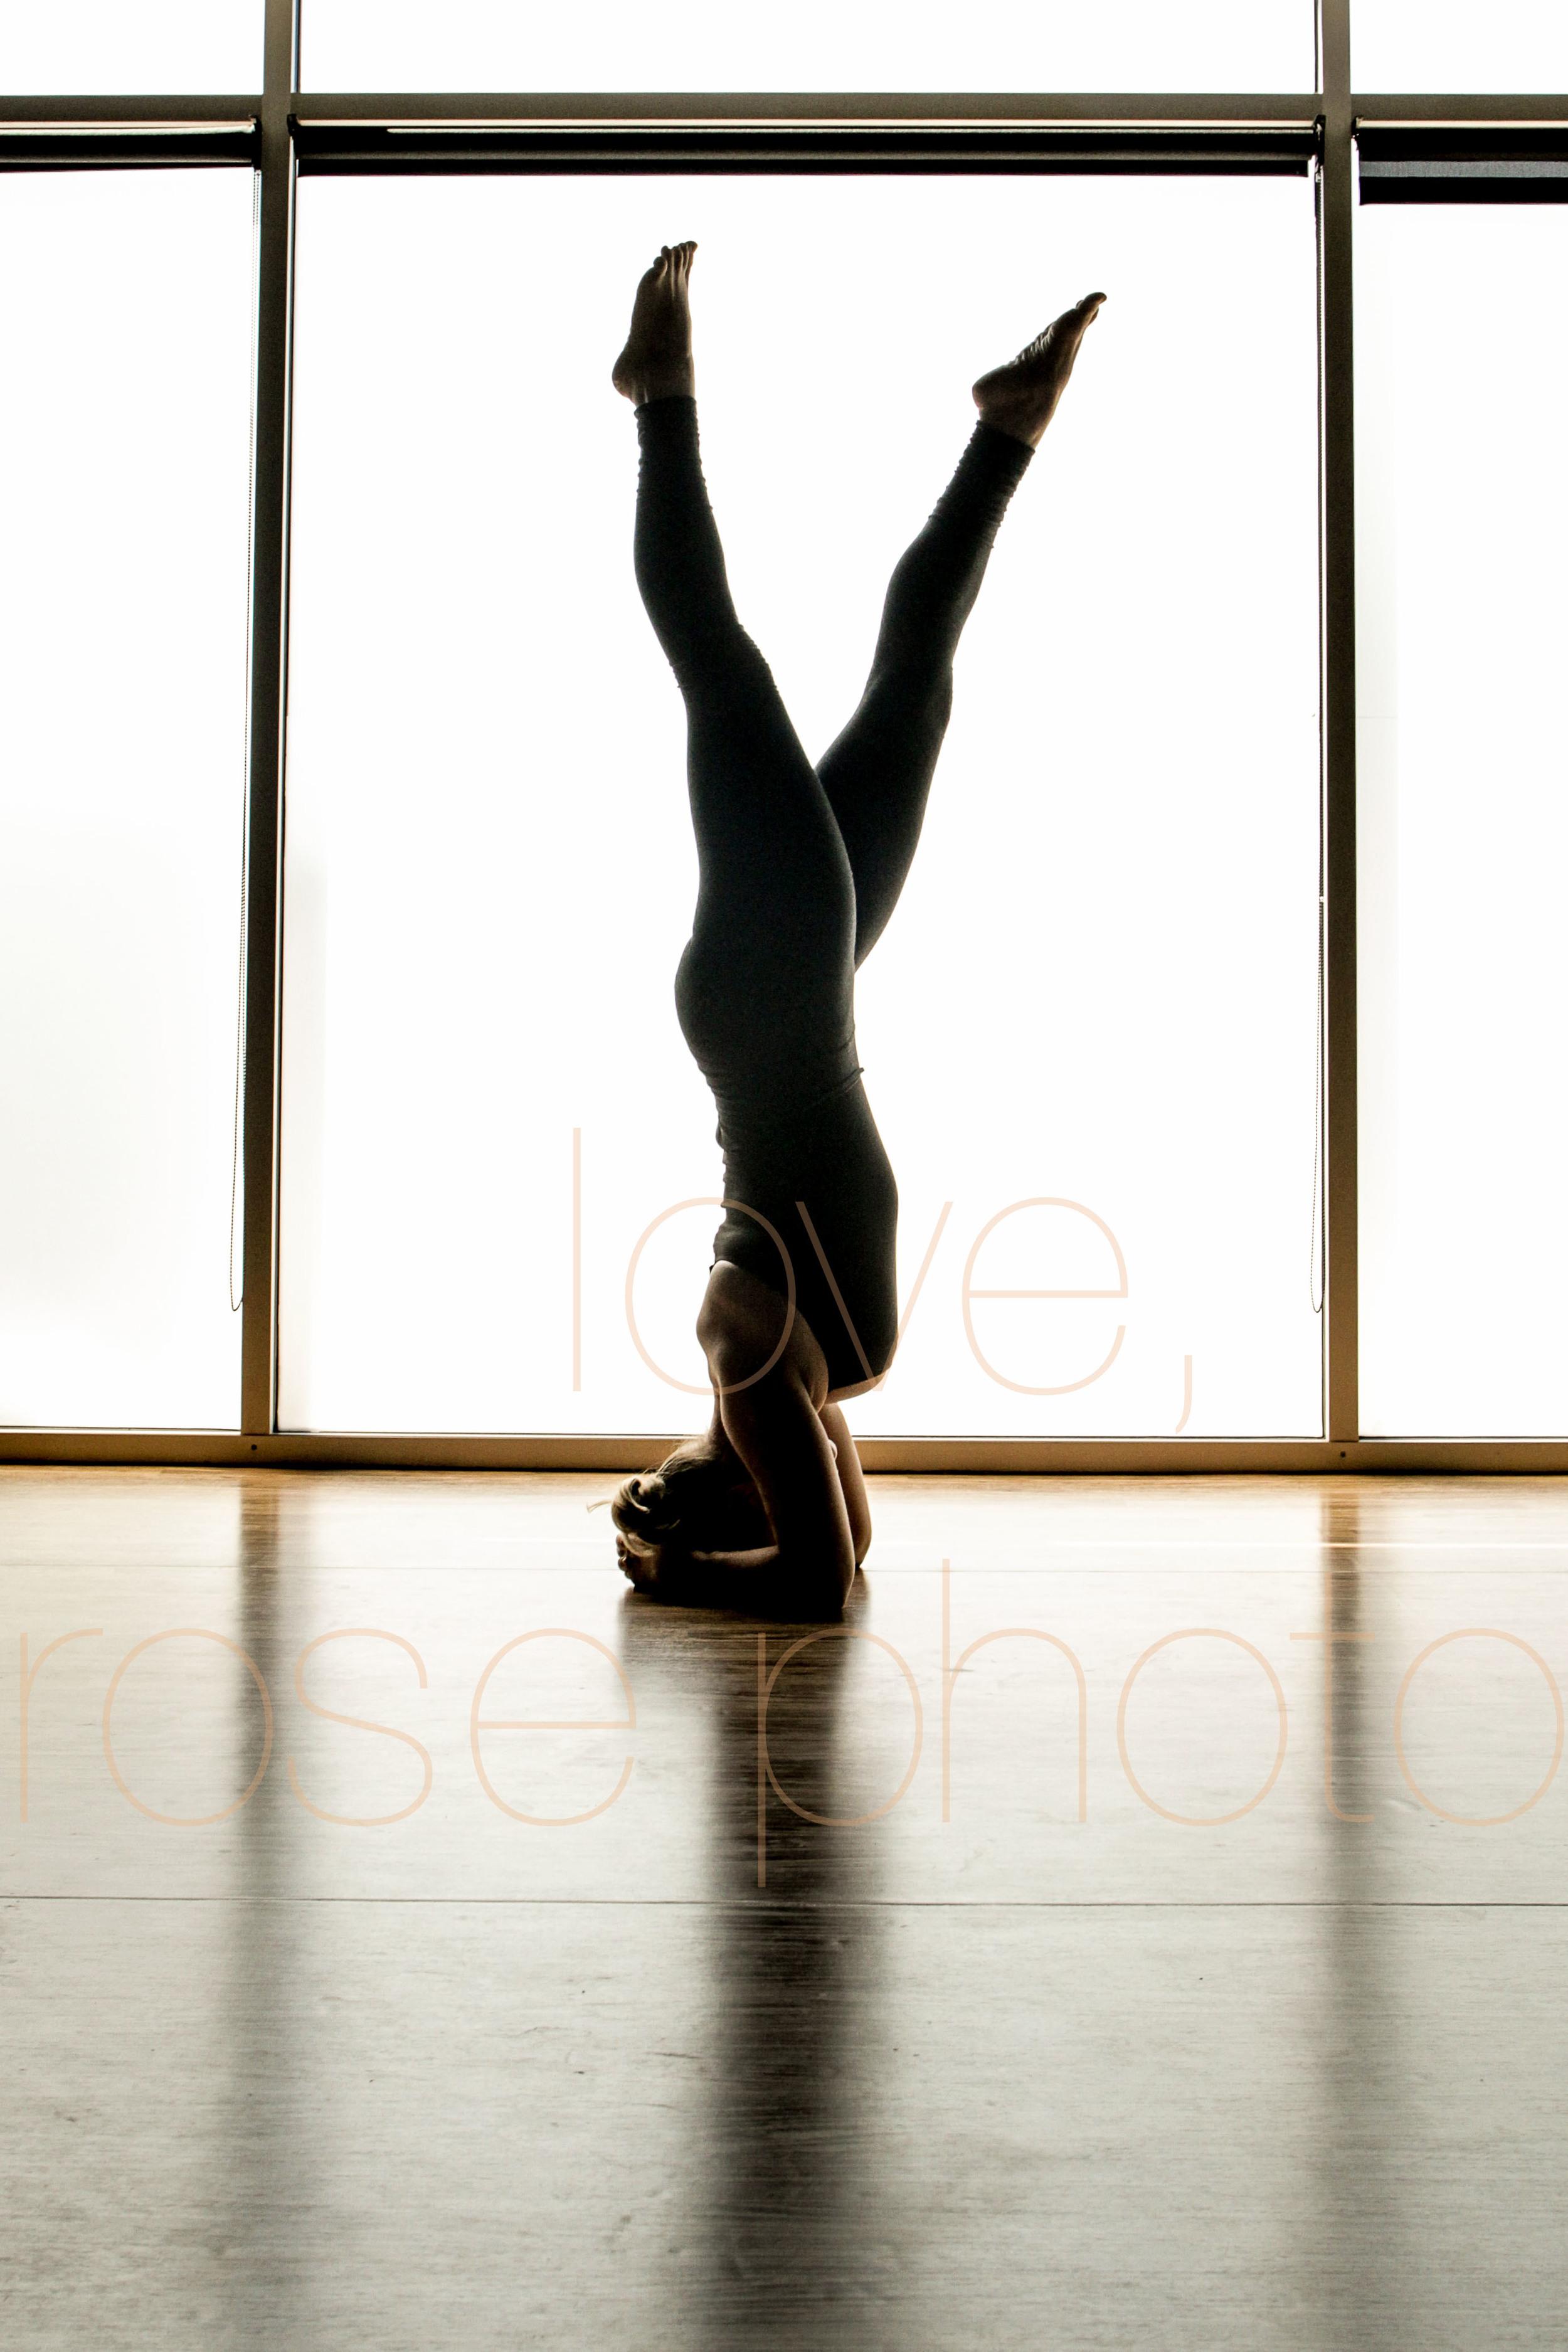 Bridget Skaggs yoga instructor Core Power Yoga Chicago West Loop power vinyasa flow yoga-2.jpg